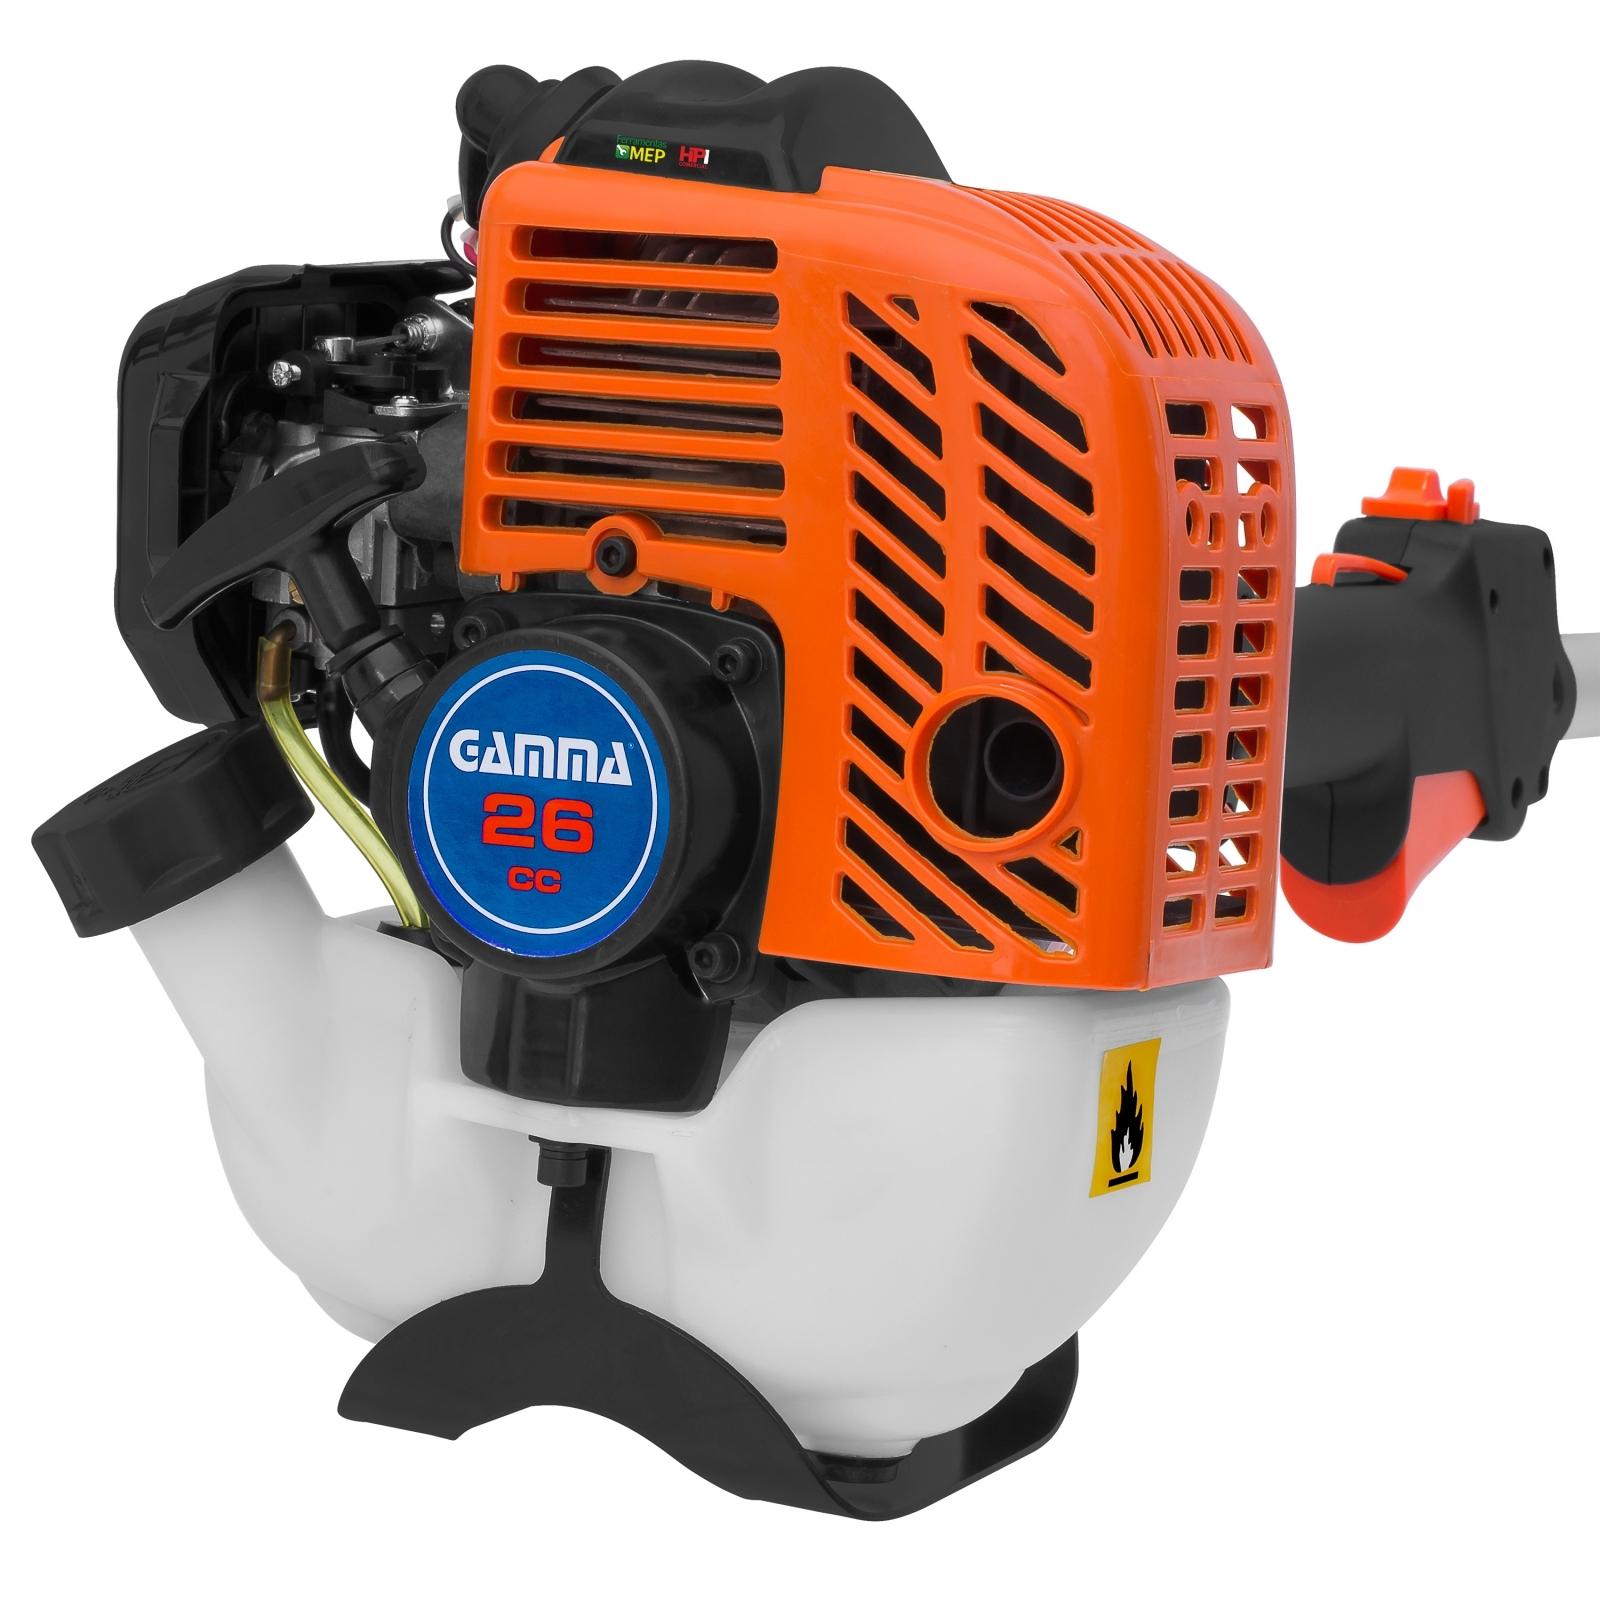 Roçadeira E Aparador de Grama A Gasolina Gamma Modelo G1831BR - Ferramentas MEP